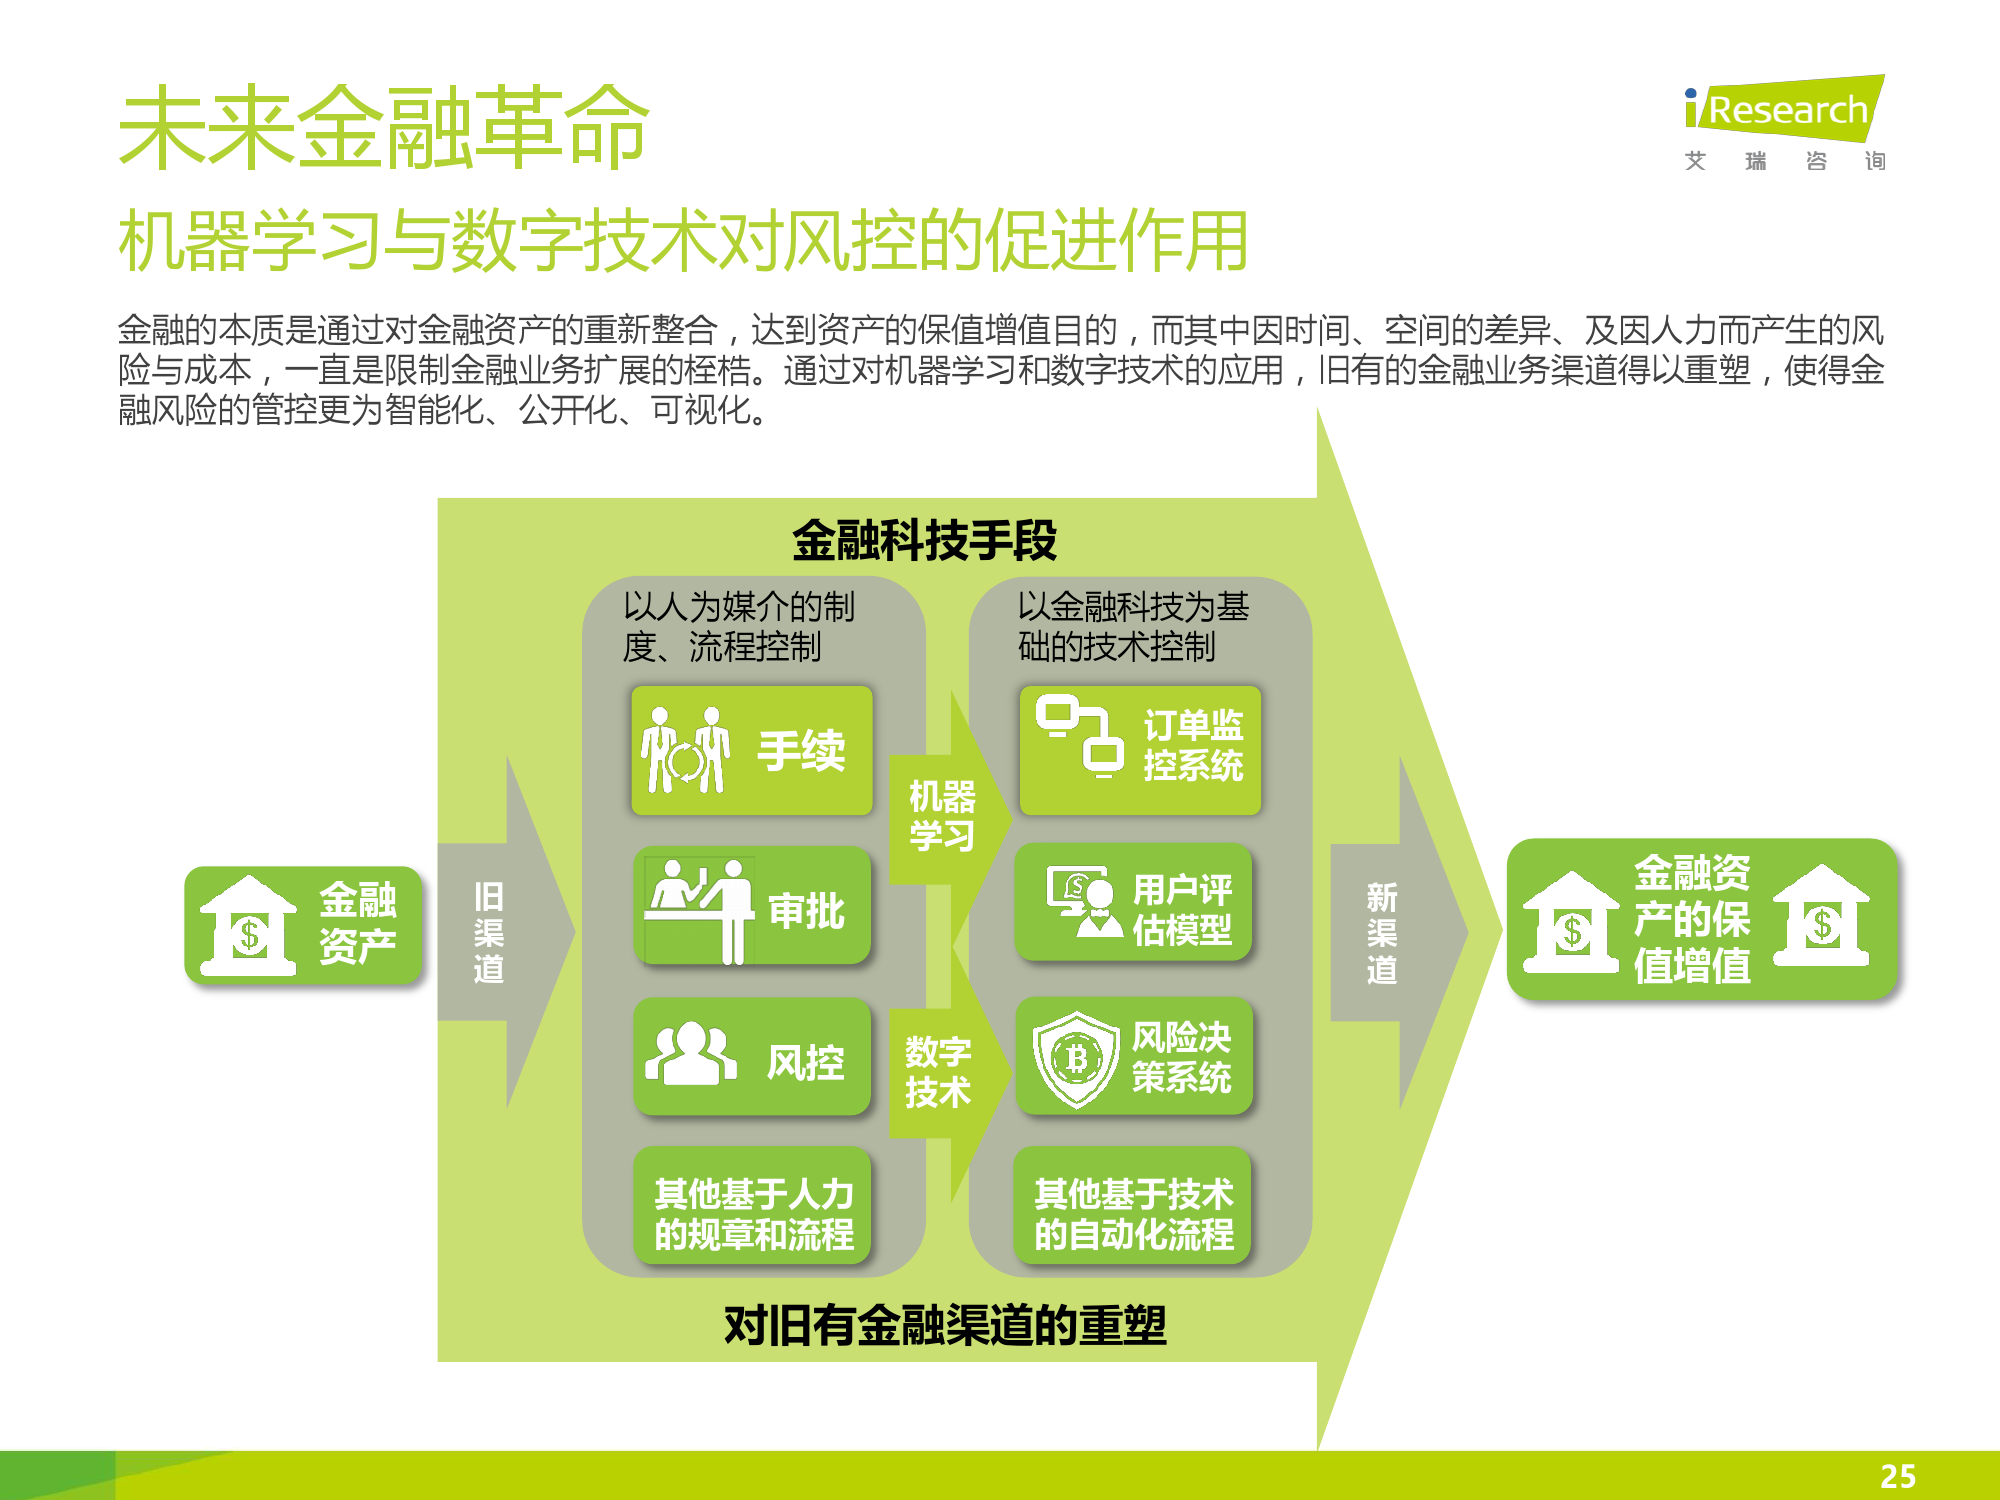 iResearch-2016年中国互联网消费金融市场研究报告_000025